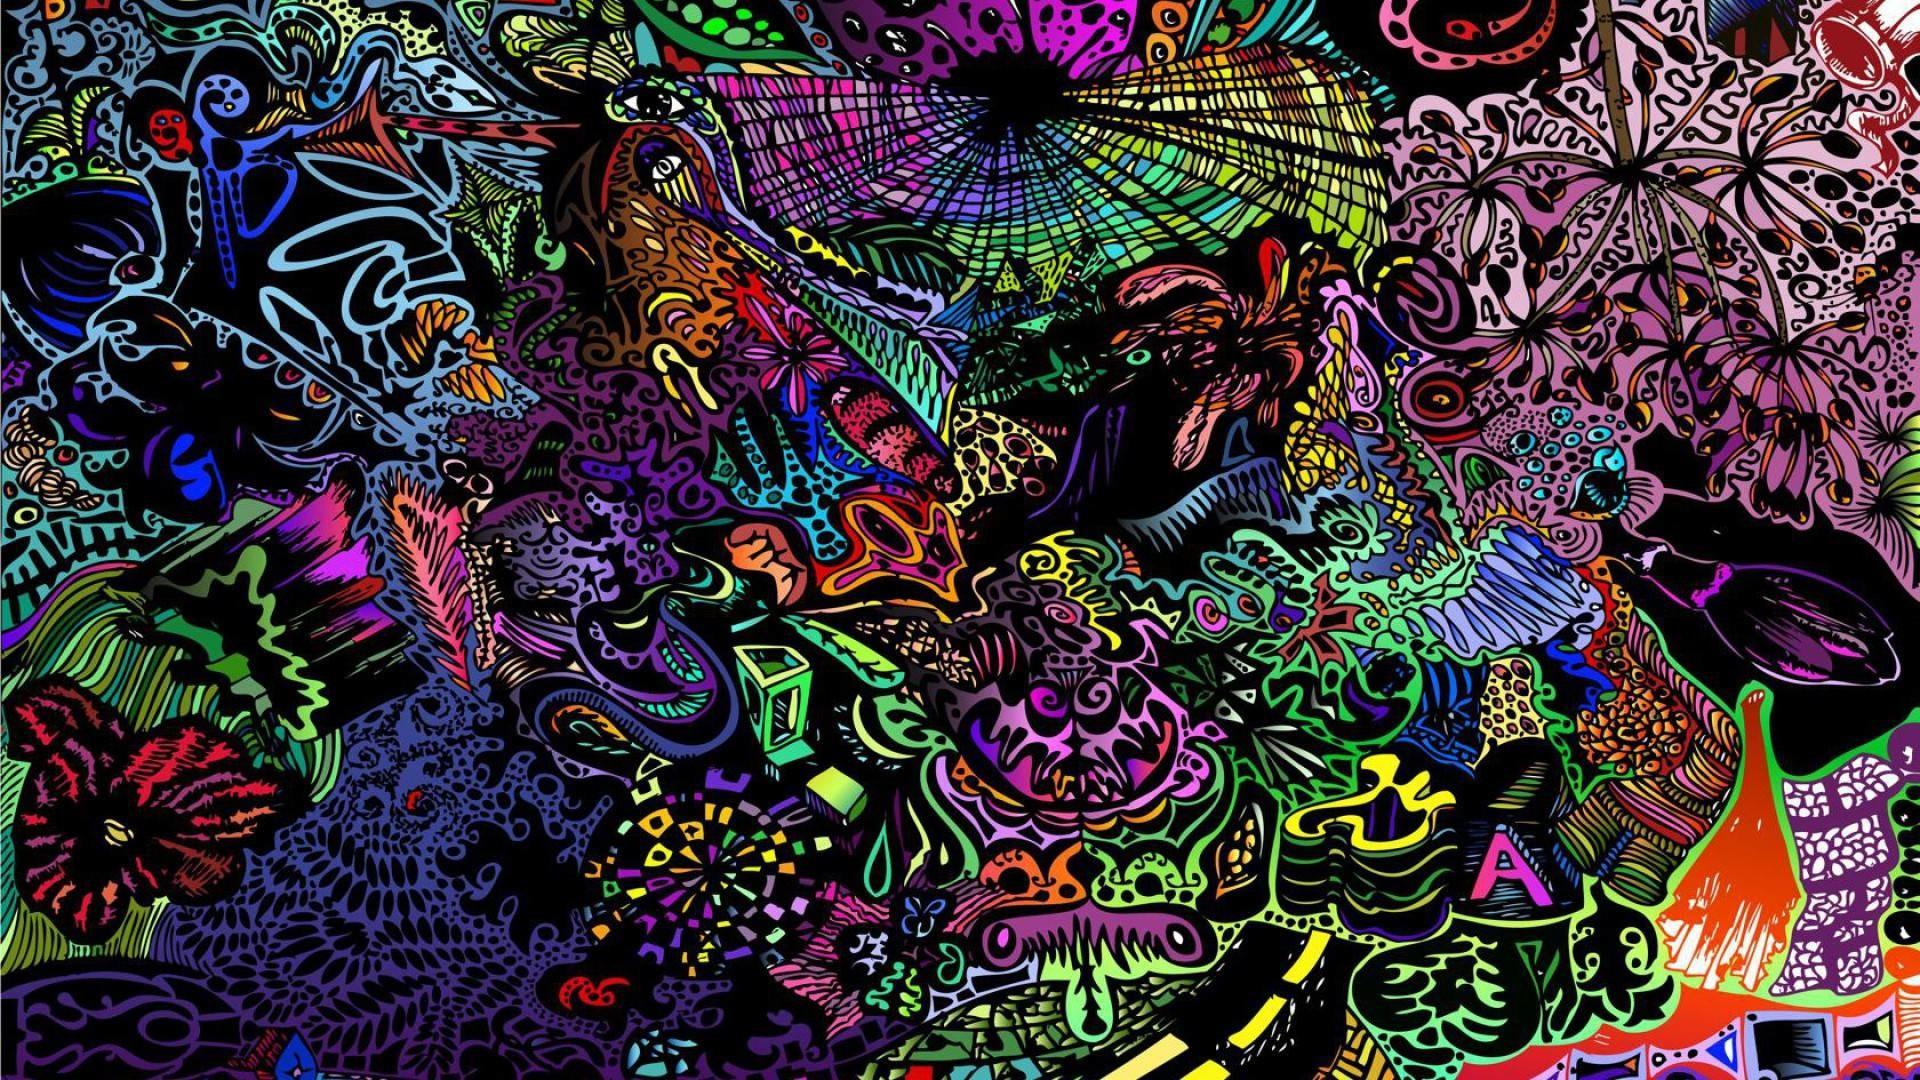 Marijuana Hd Wallpapers Free Download Stoner Wallpapers Hd 55 Images